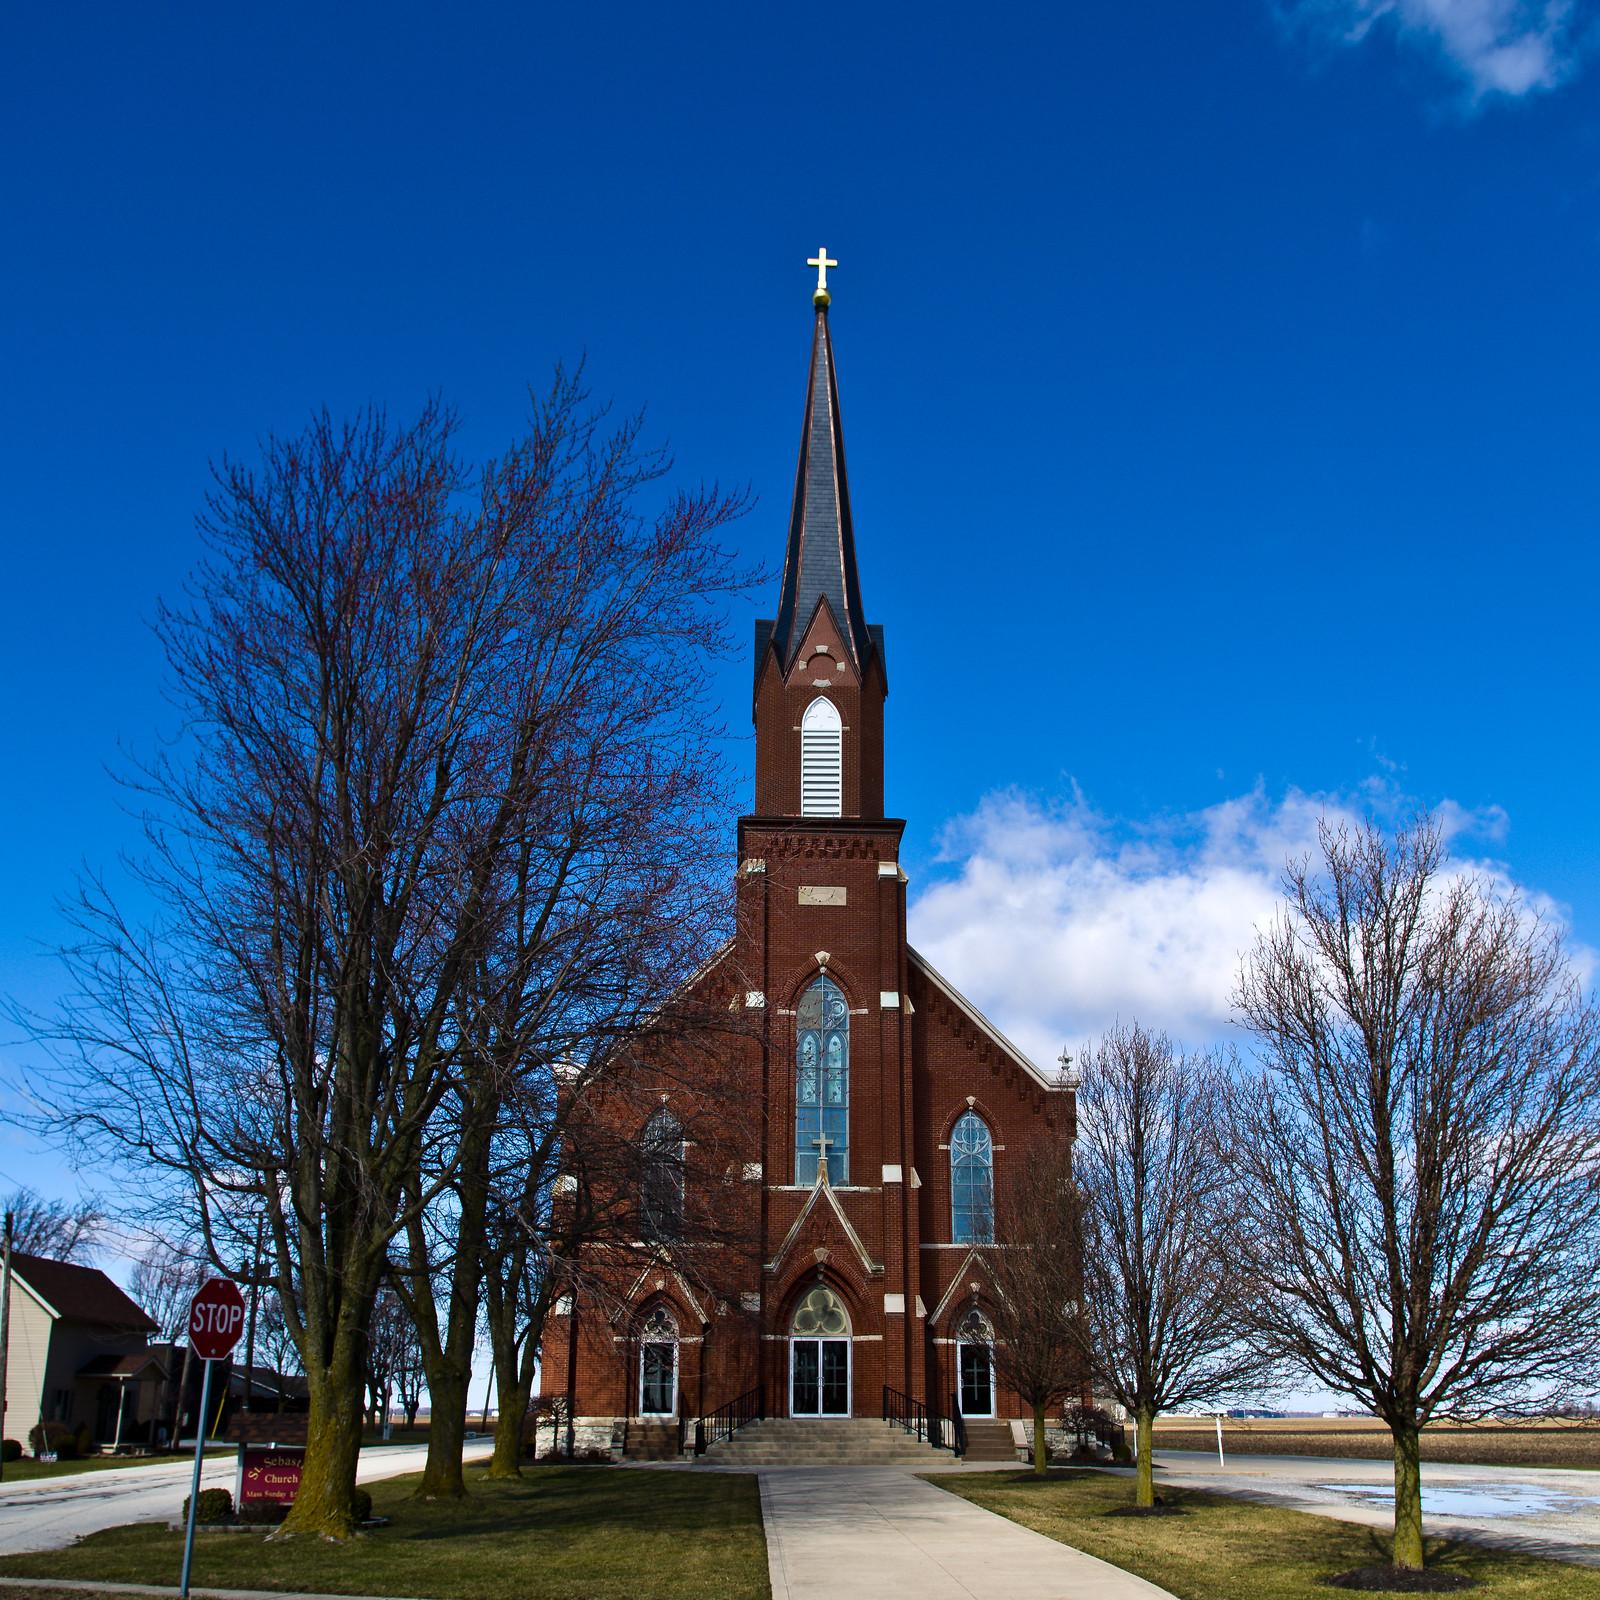 burkettsville dating Welcome to st john the evangelist catholic church  headlines st john the evangelist catholic church 502 s park blvd, streamwood, il 60107.